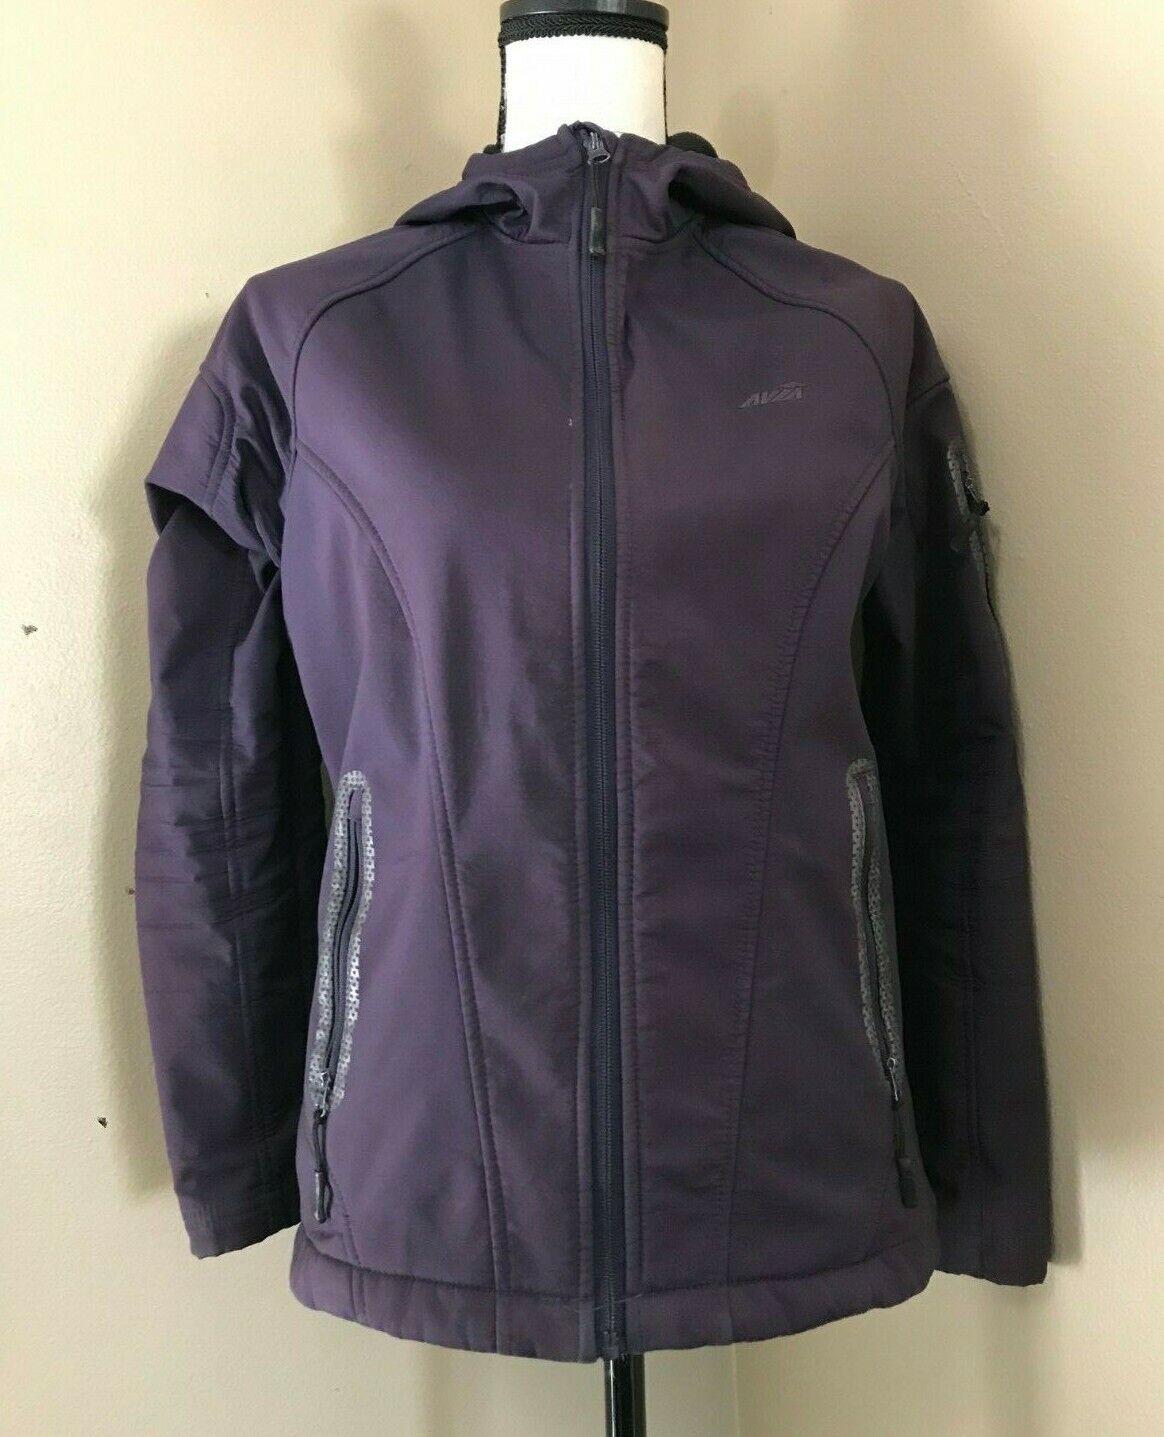 AVIA Women's S Purple Fleece Lined Reflective Active JACKET Stretch Hoodie